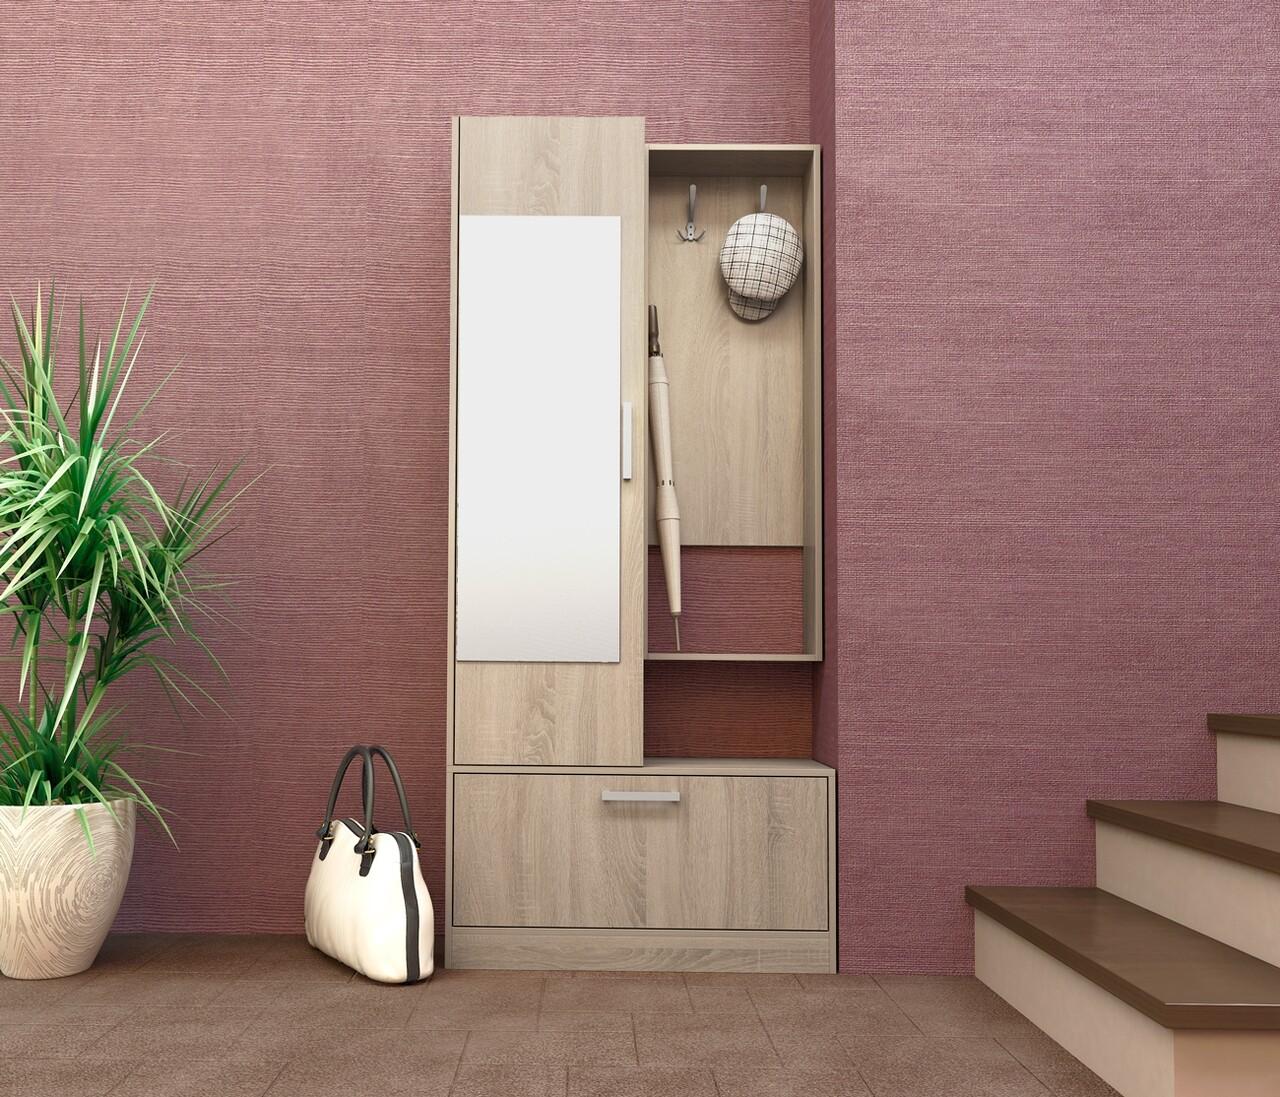 Dulap cu pantofar, cuier si oglinda, Bedora, City 4005, 90 x 33.5 x 201 cm, PAL, sonoma